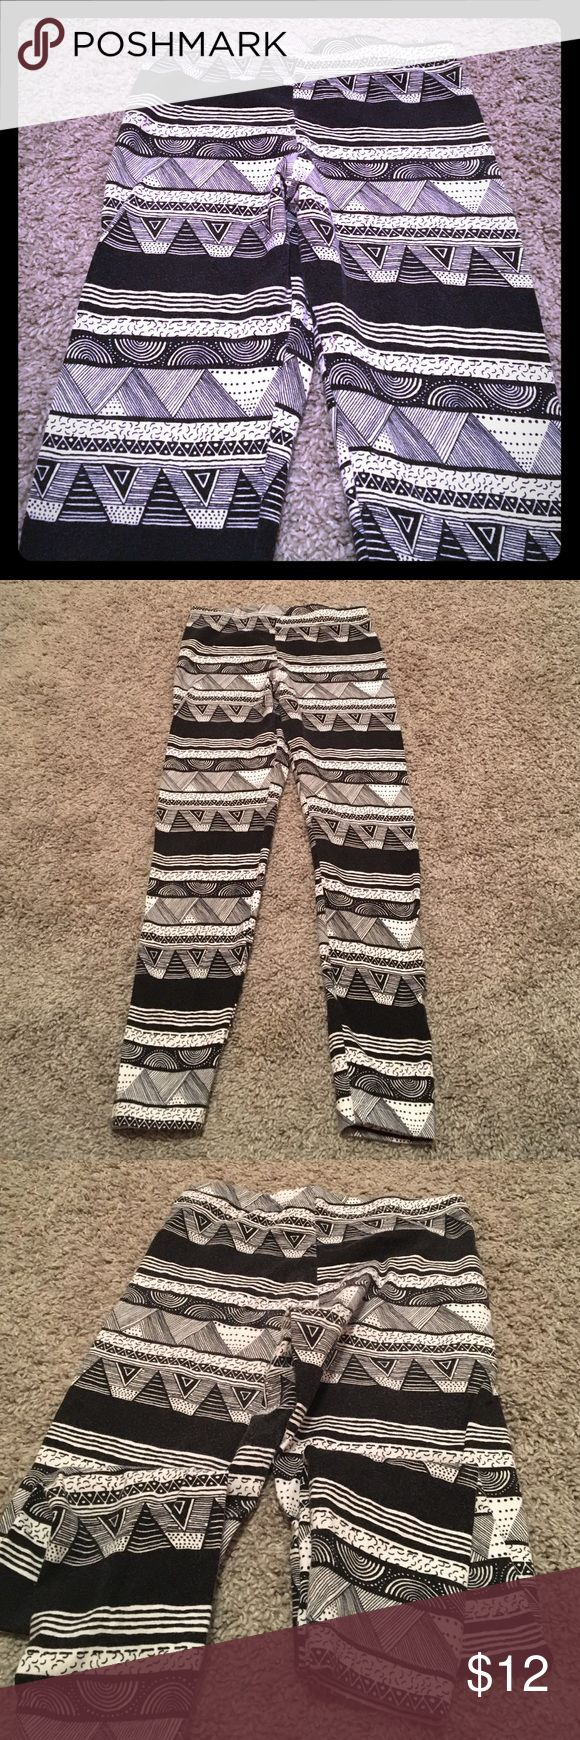 American Apparel Leggings Black and White tribal patterned leggings American Apparel Pants Leggings